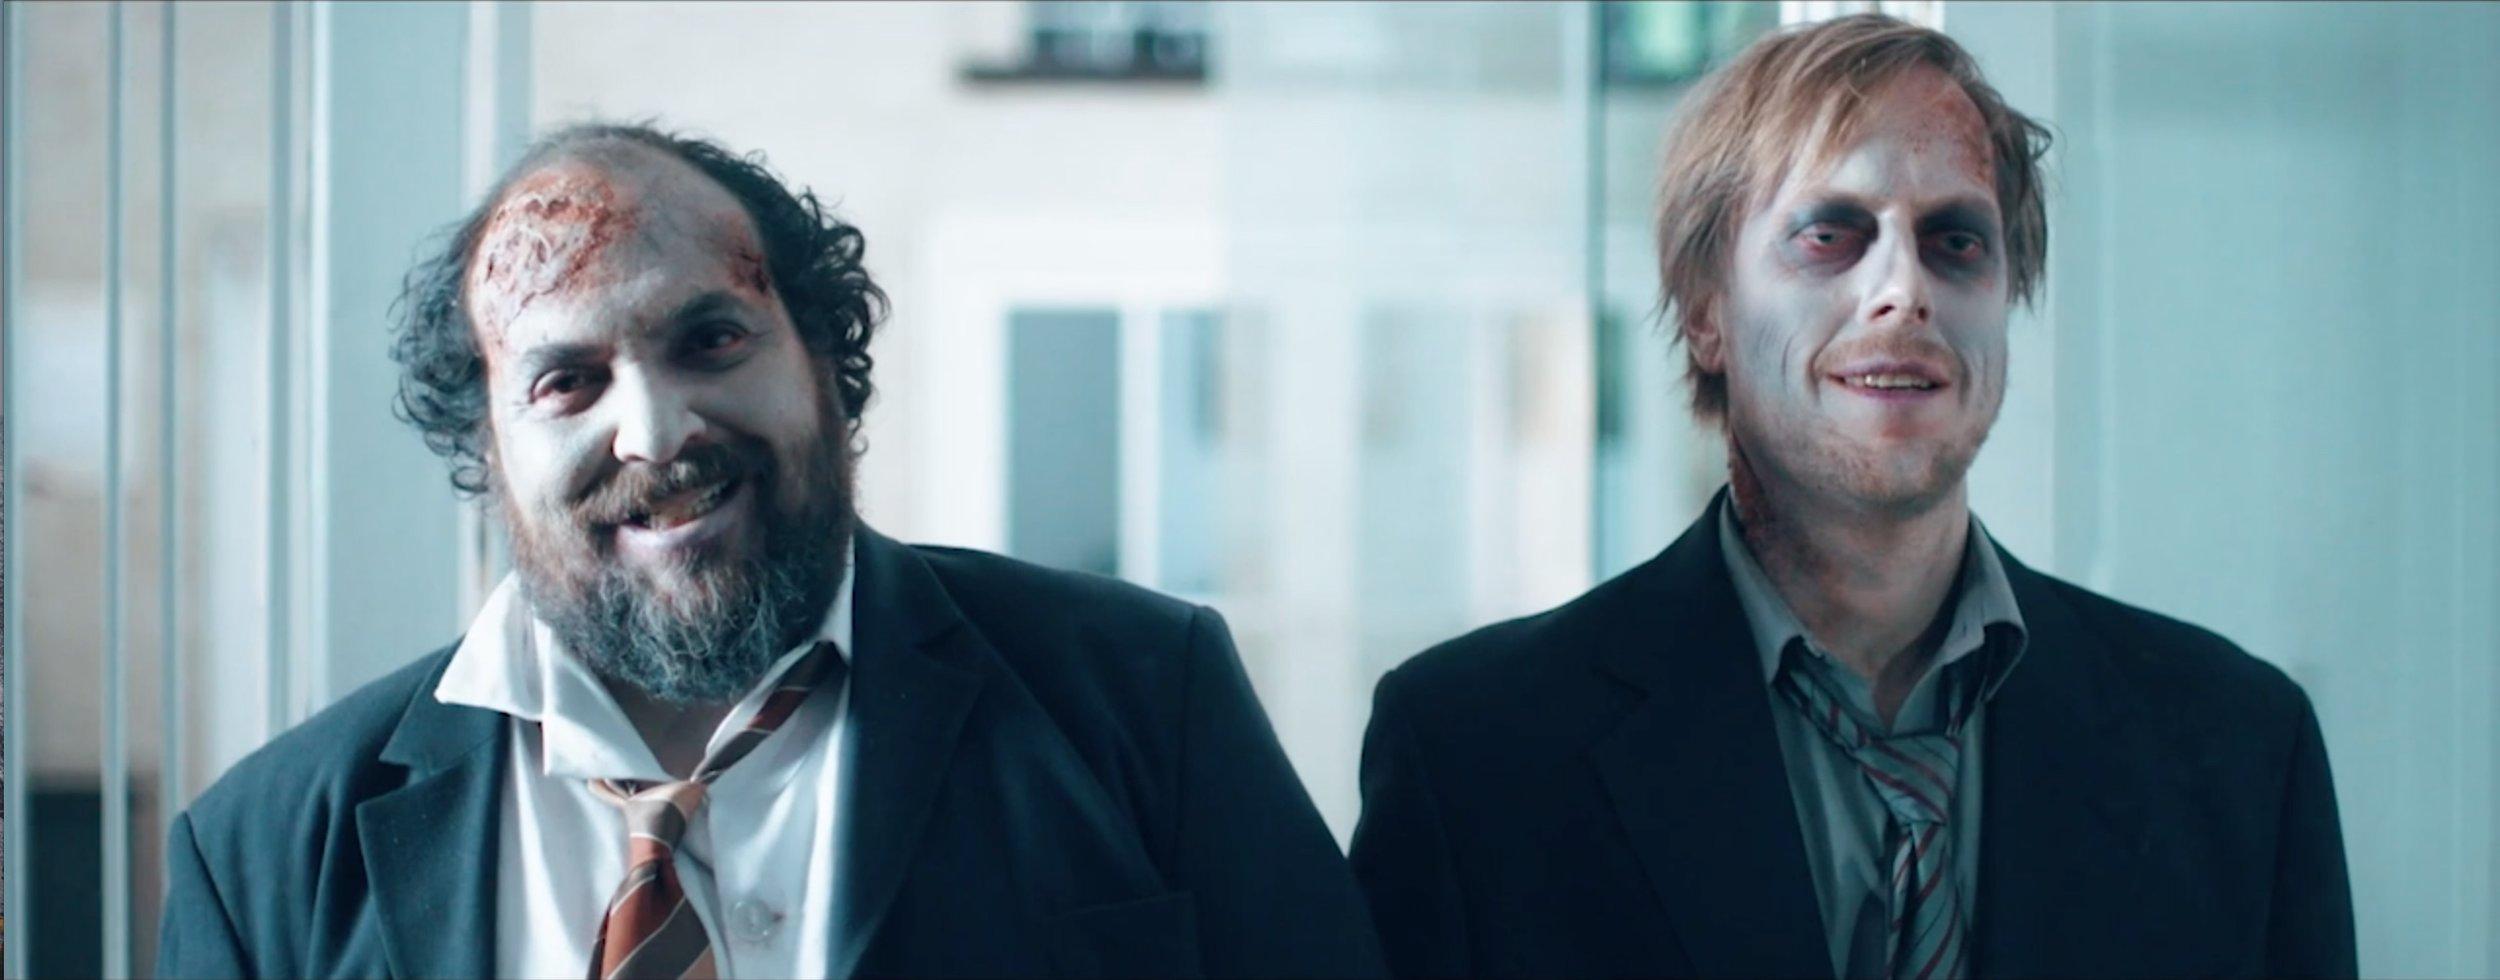 Phil (Joe Vaz) and Bob (Damon Berry), friends for eternity.